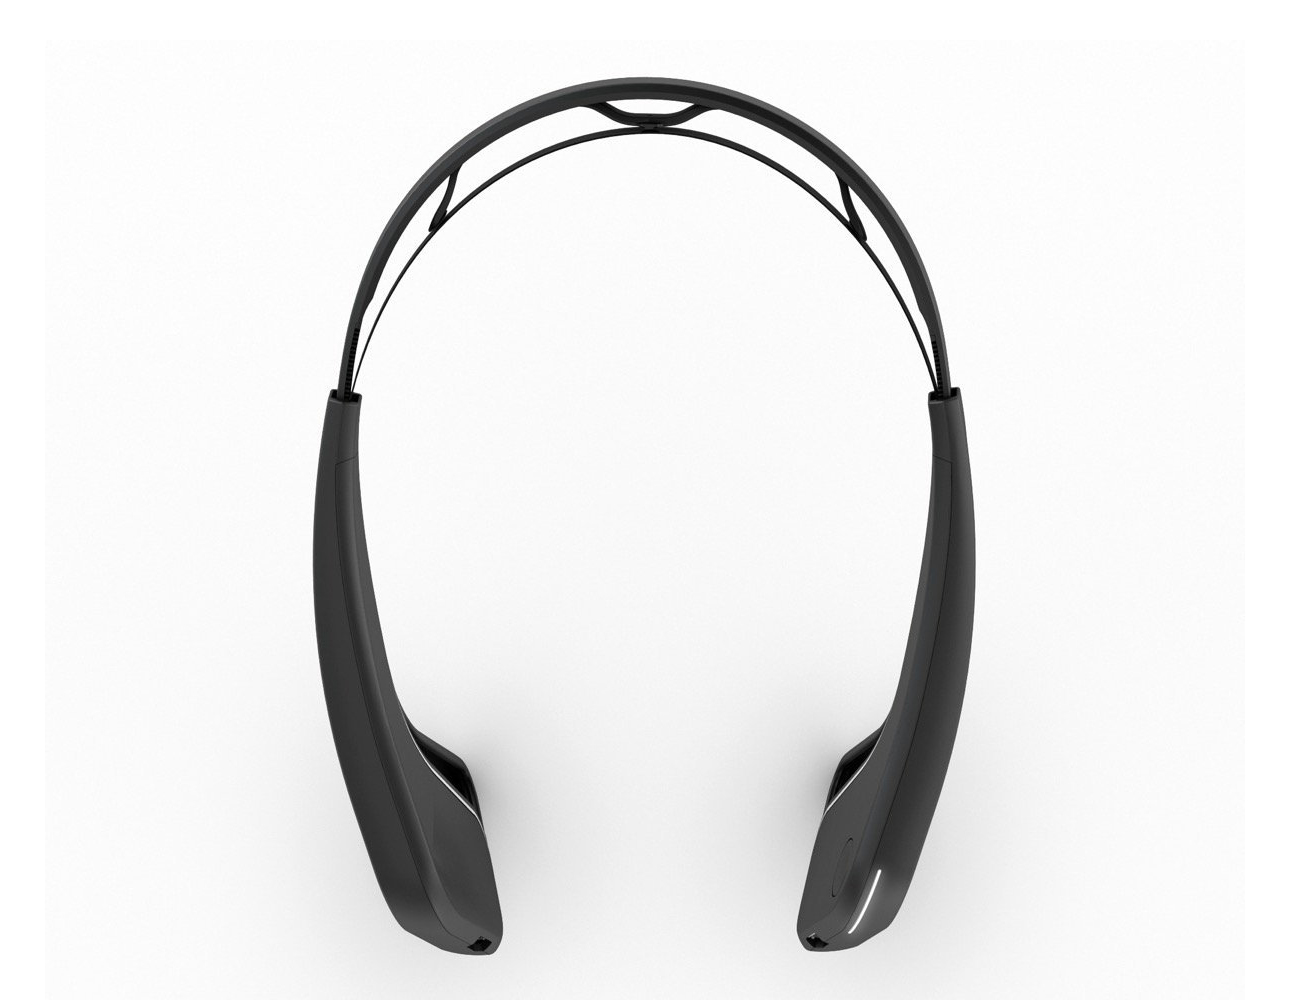 muse – The Brain Sensing Headband